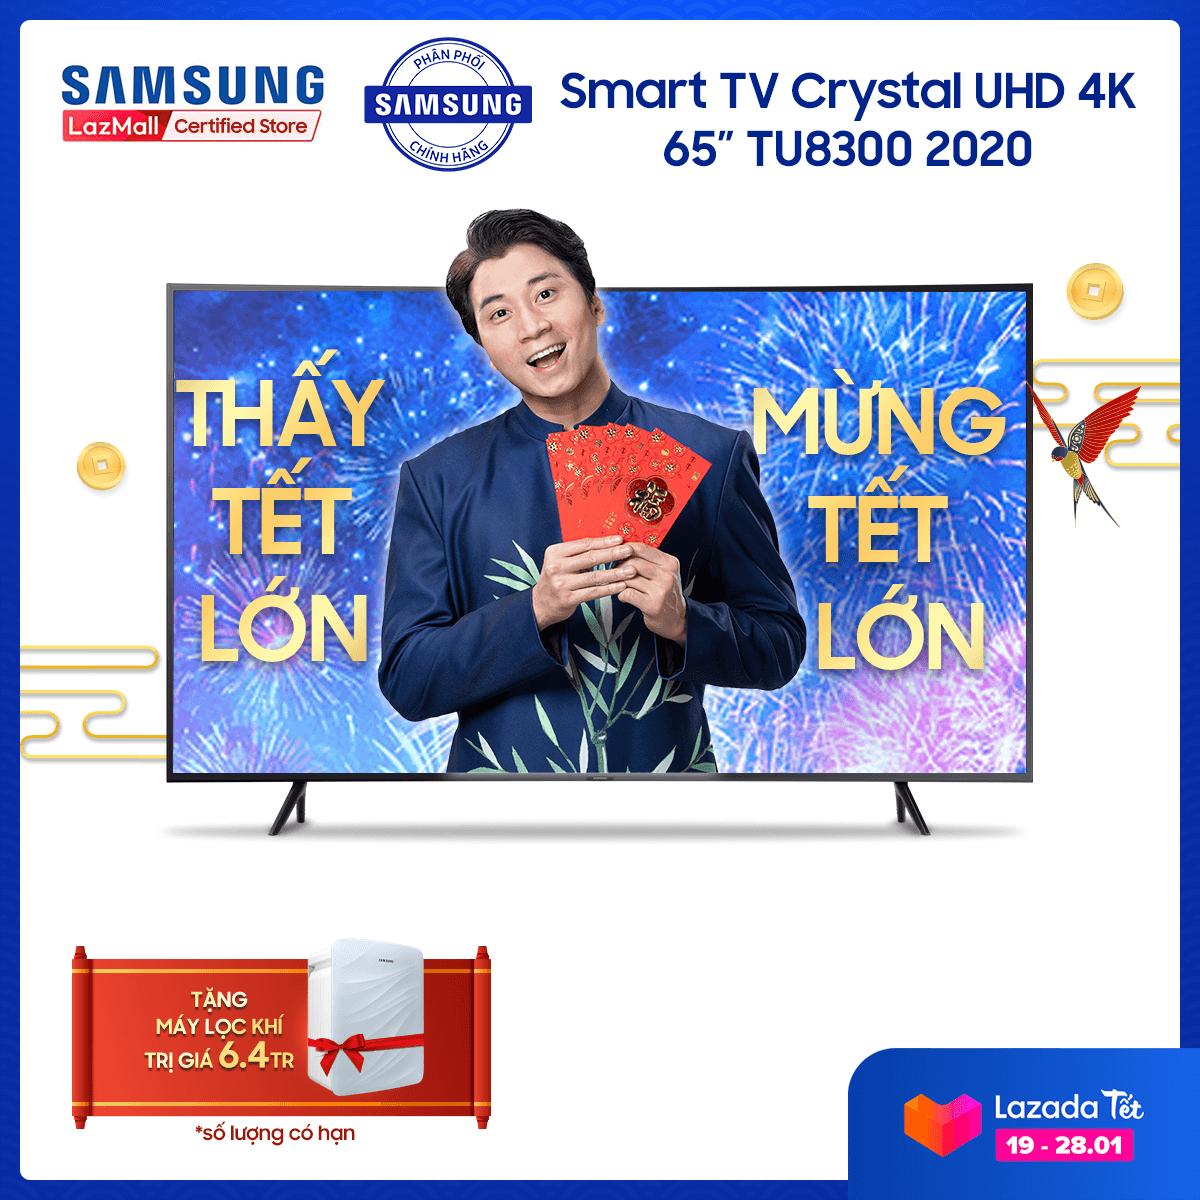 Smart TV Samsung Crystal UHD 4K 65 inch TU8300 2020 – TV